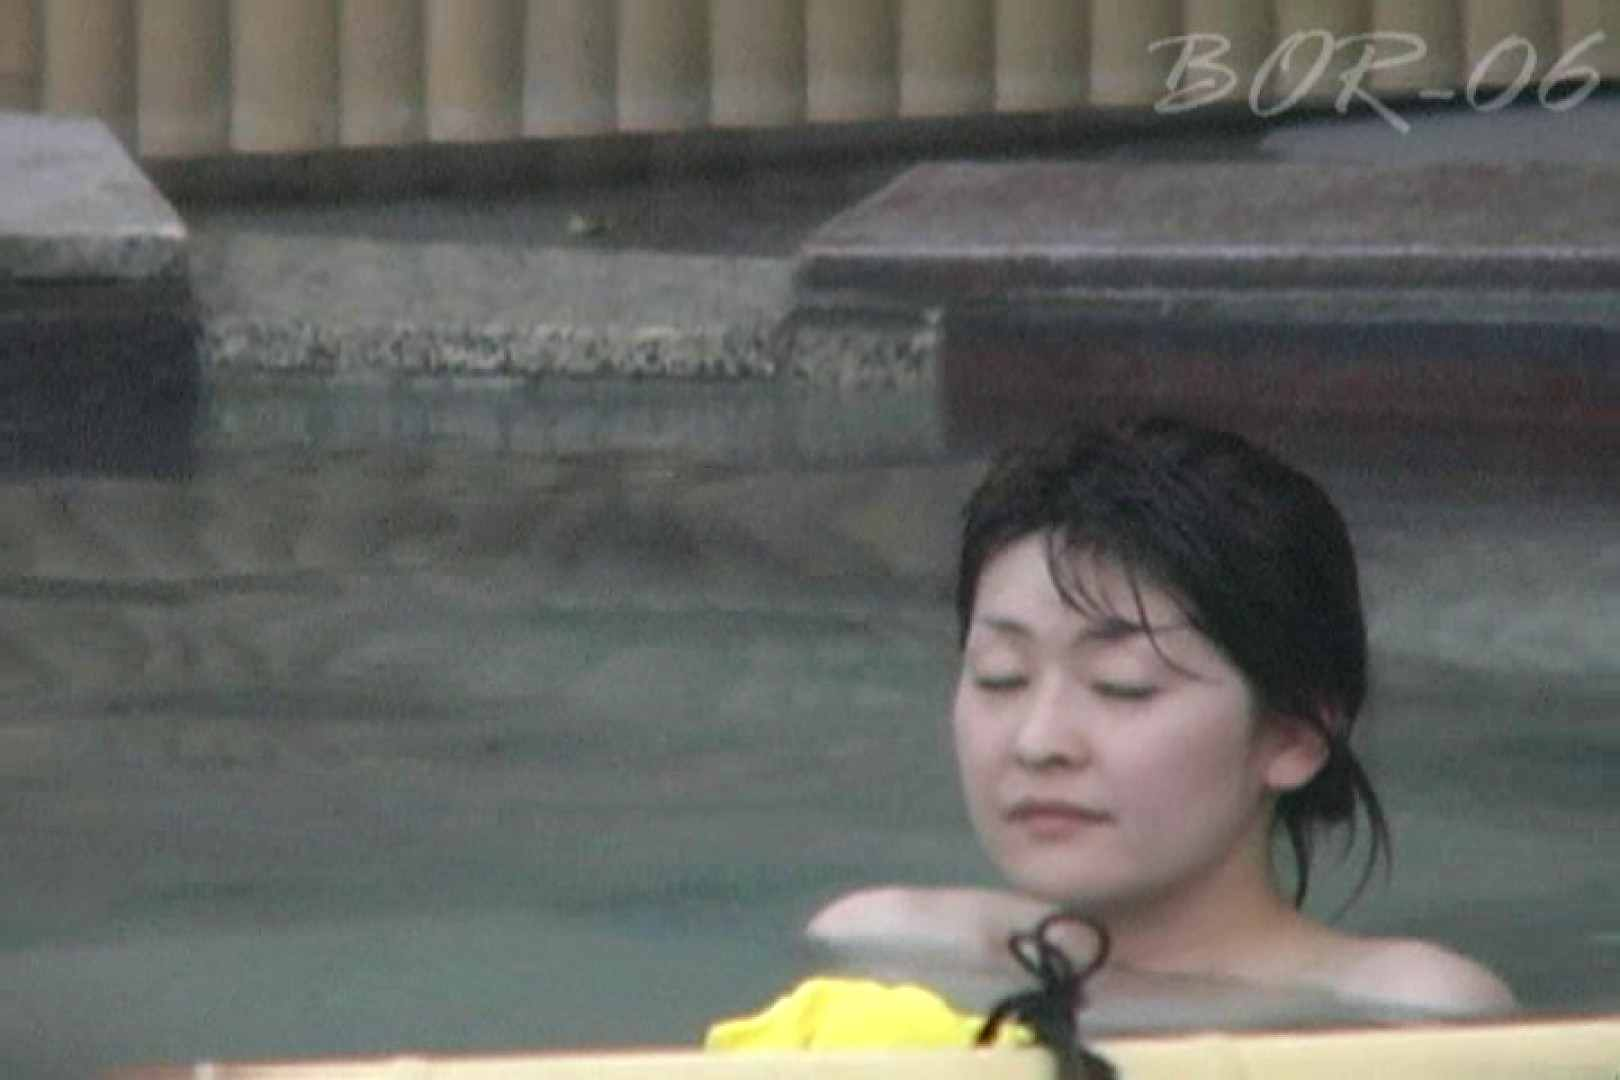 Aquaな露天風呂Vol.523 盗撮映像  93Pix 76